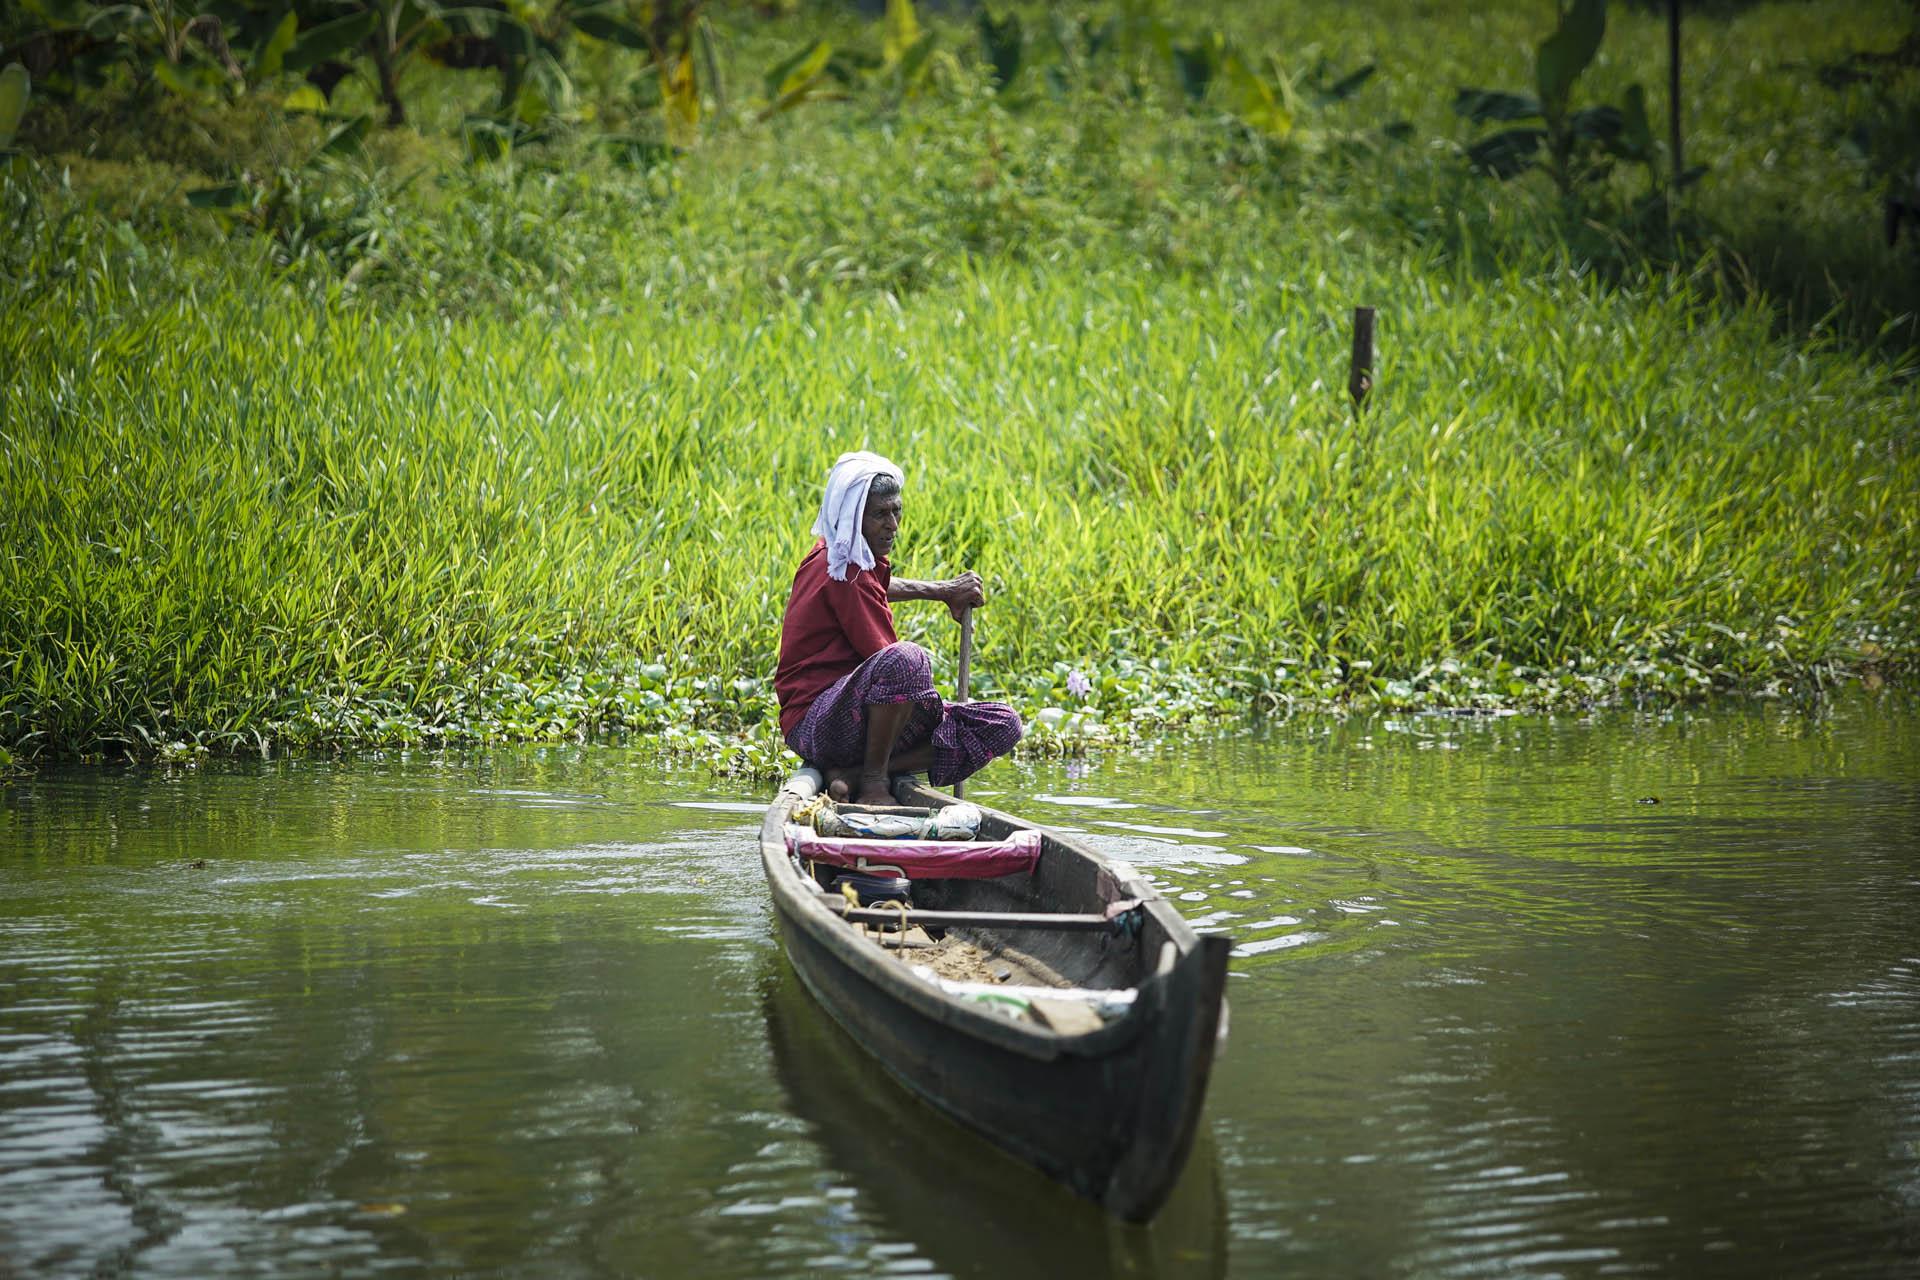 Fisherman at the Backwaters, Kerala